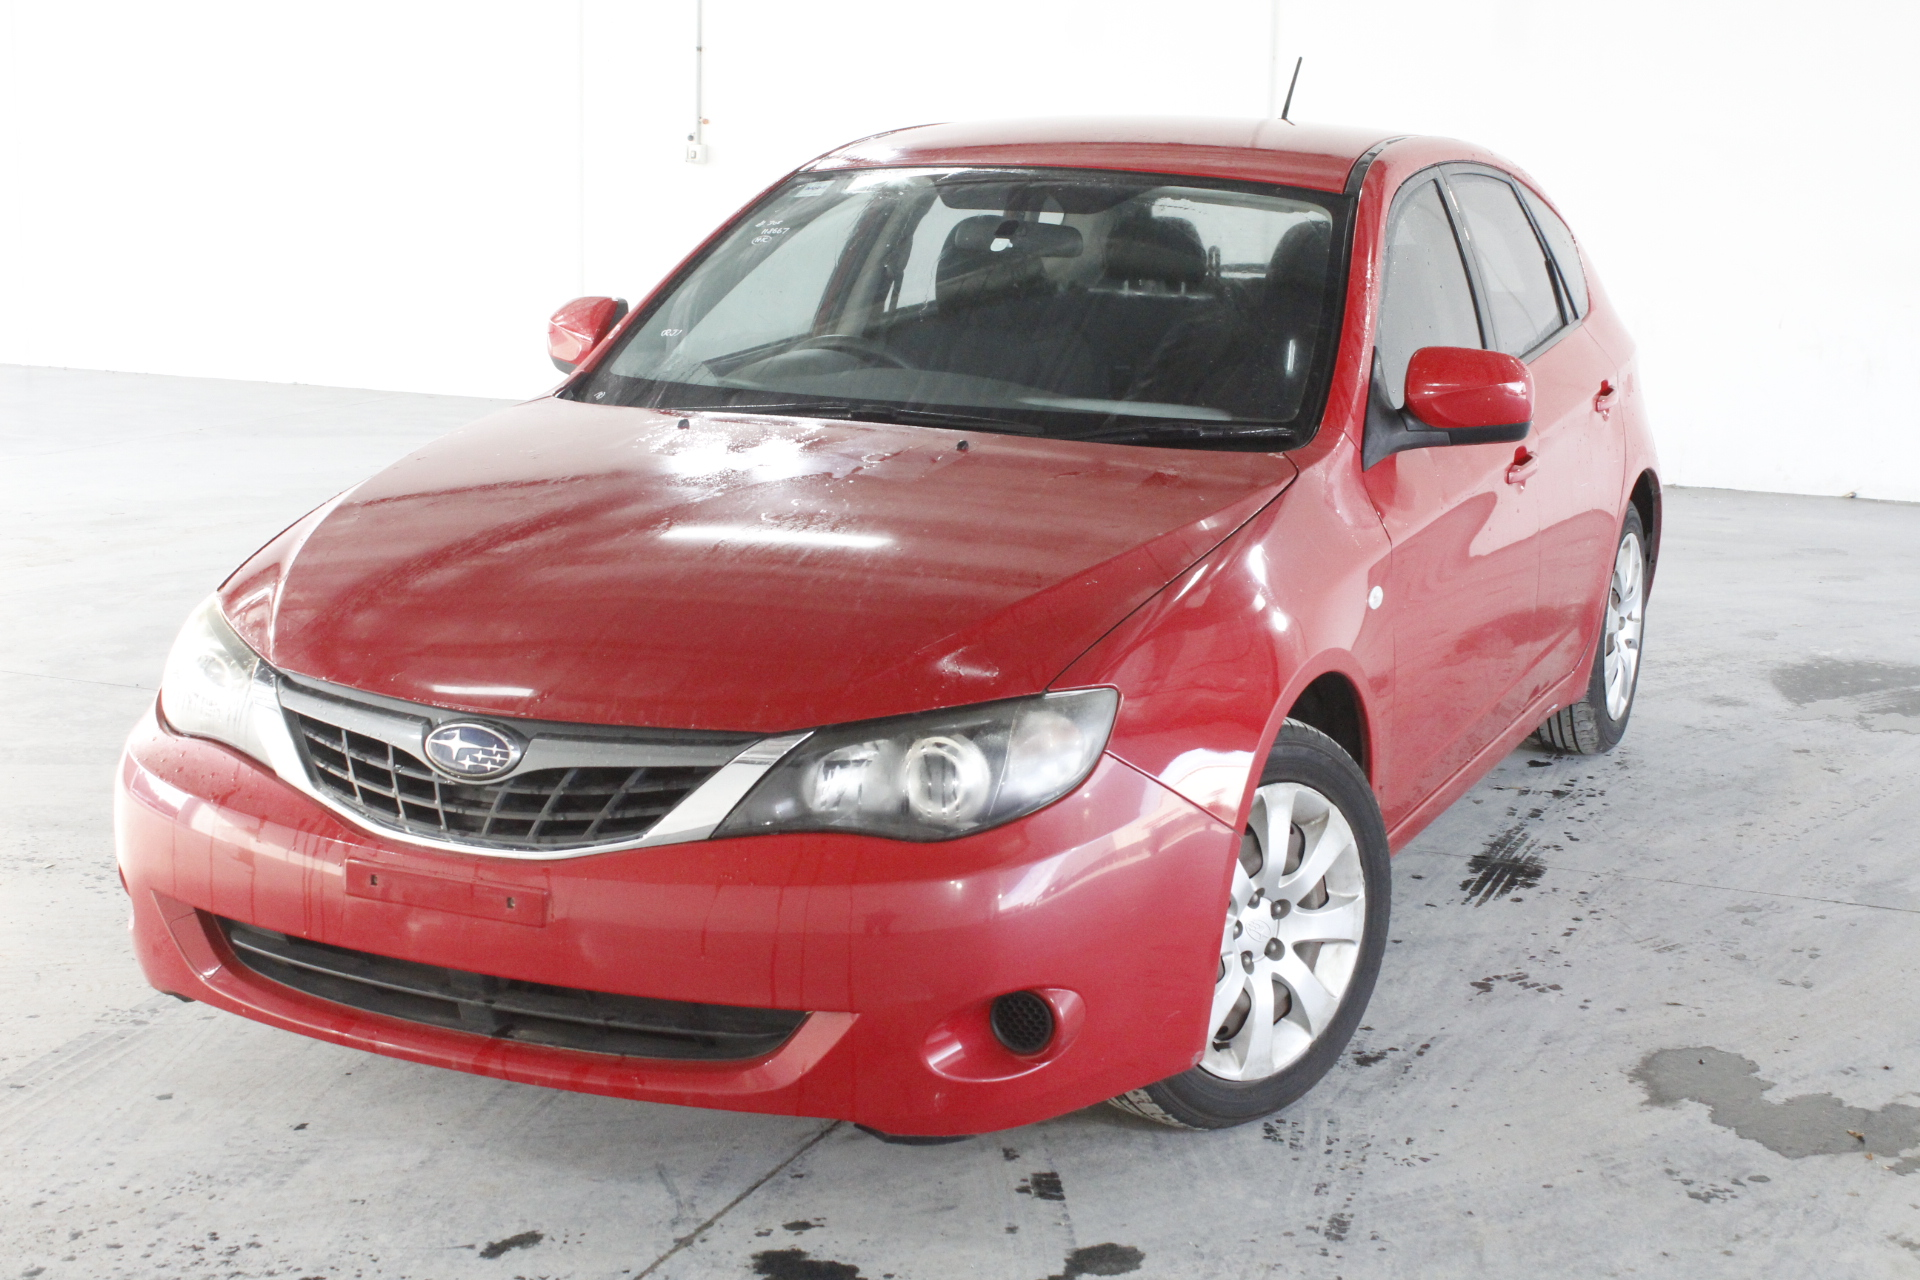 2007 Subaru Impreza R (AWD) G3 Automatic Hatchback